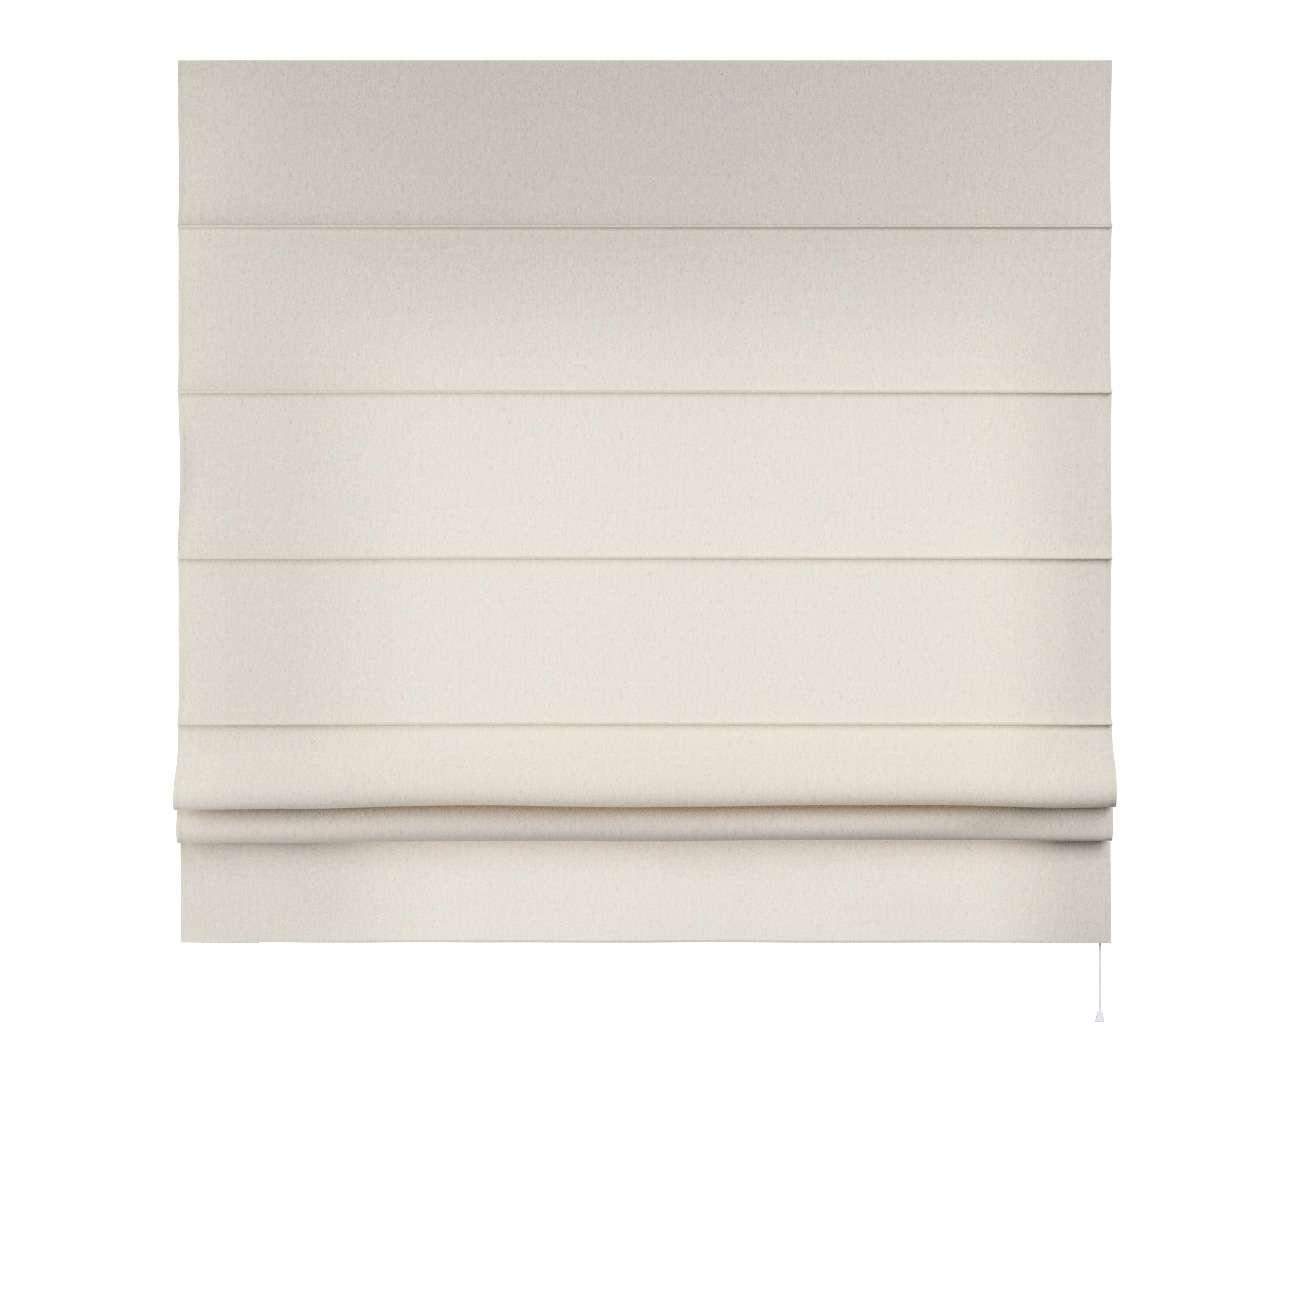 Raffrollo Padva 80 x 170 cm von der Kollektion Loneta, Stoff: 133-65